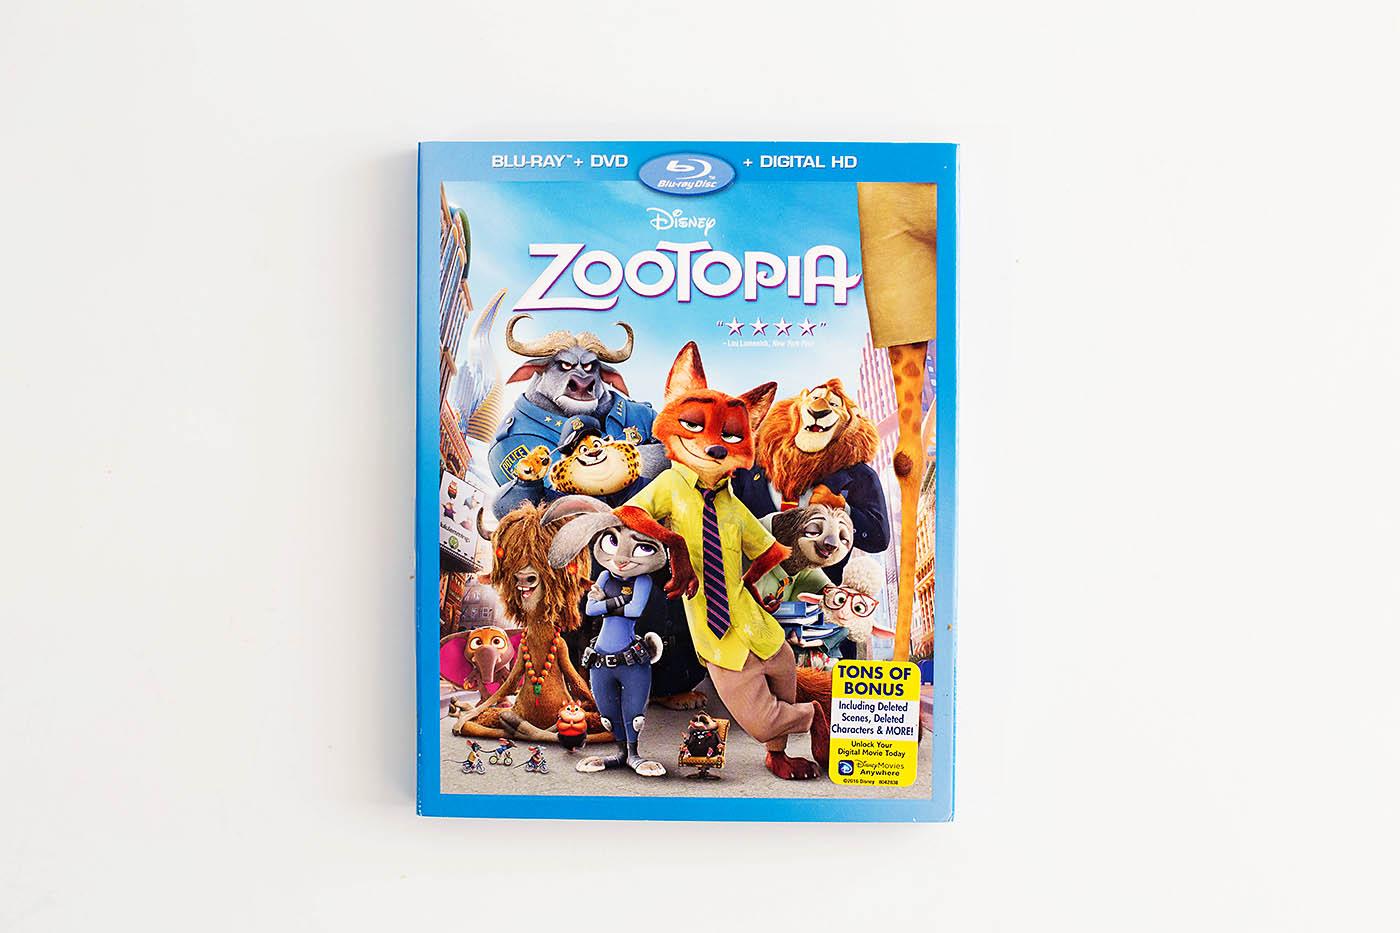 Zootopia Jumbeaux Sundaes to make at home on movie night!